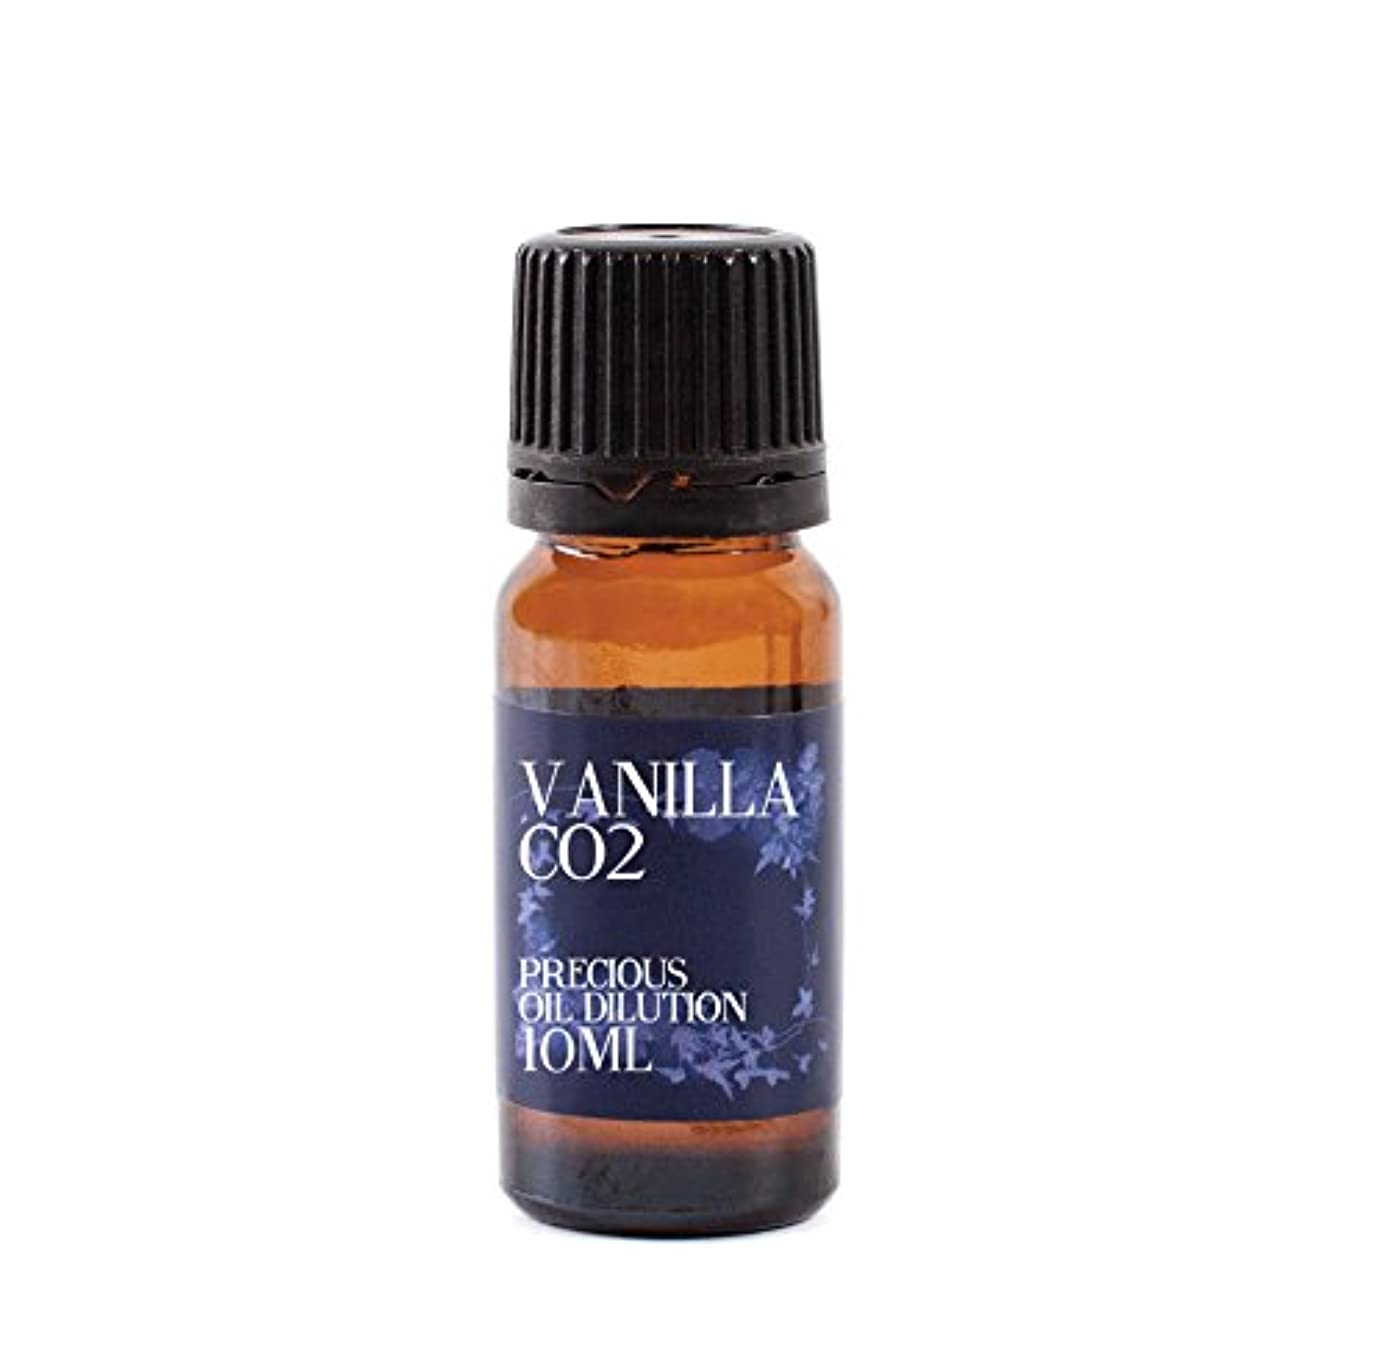 Mystic Moments   Vanilla CO2 Essential Oil Dilution - 10ml - 3% Jojoba Blend